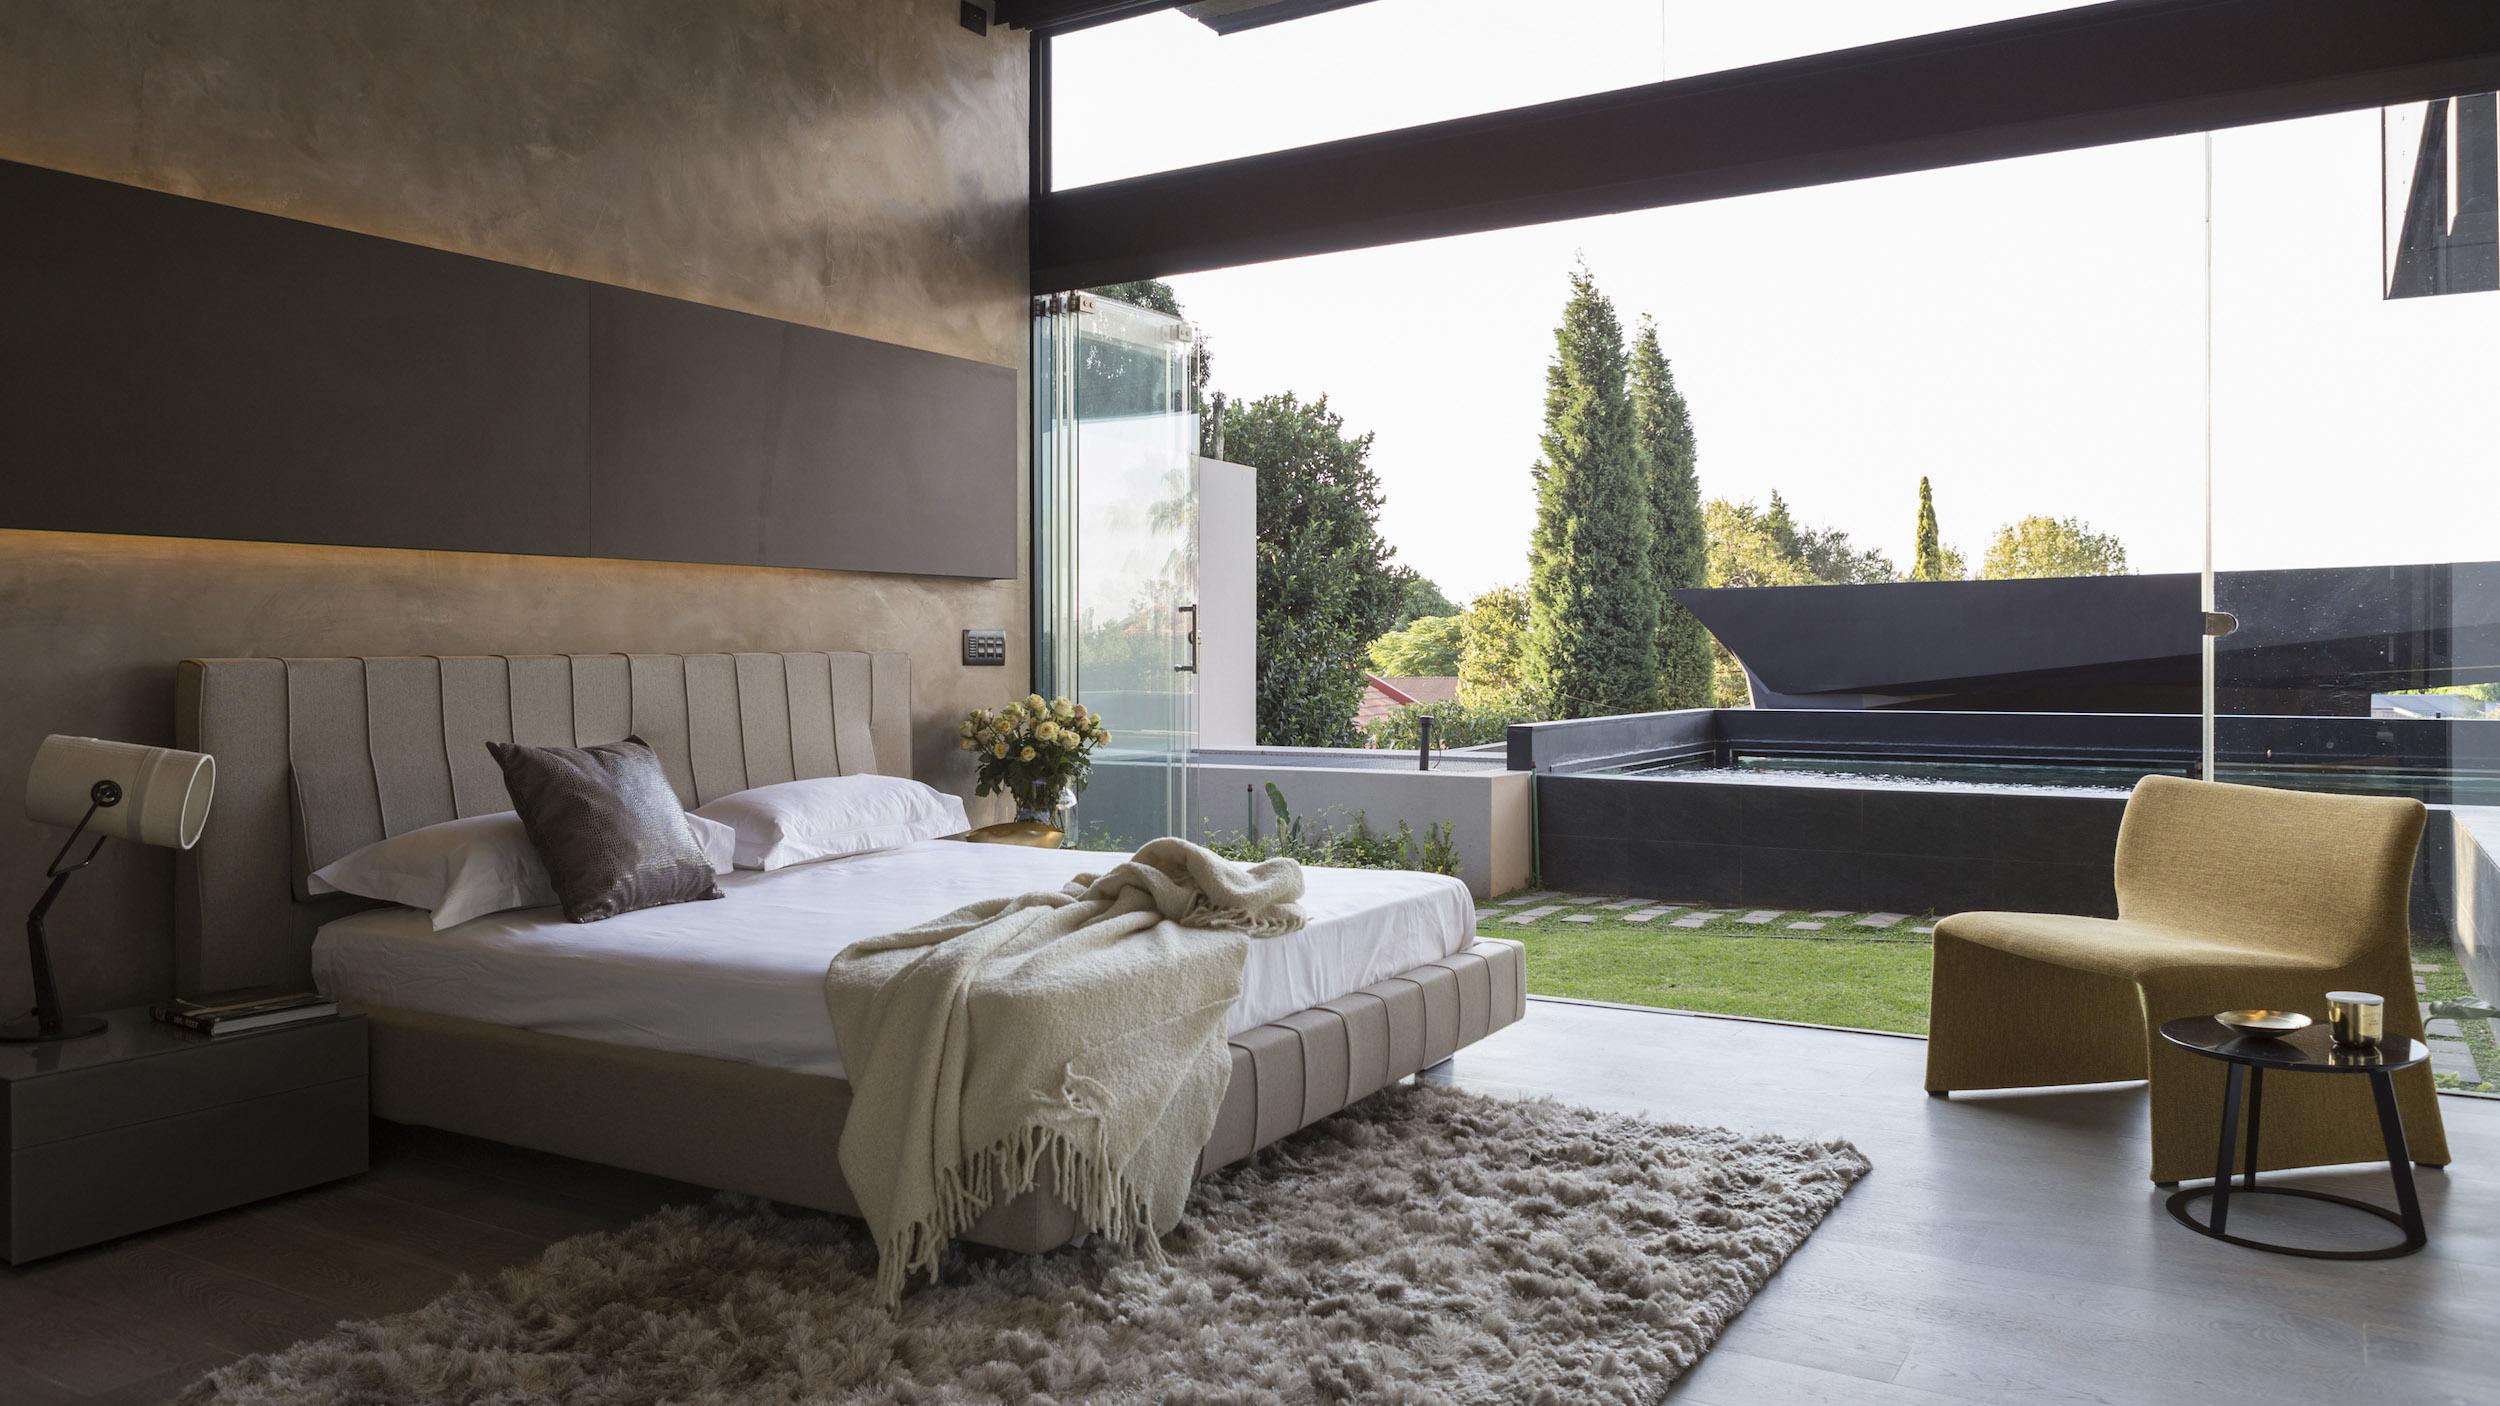 Kloof Road Masterpiece House in Johannesburg by Nico van der Meulen Architects-32